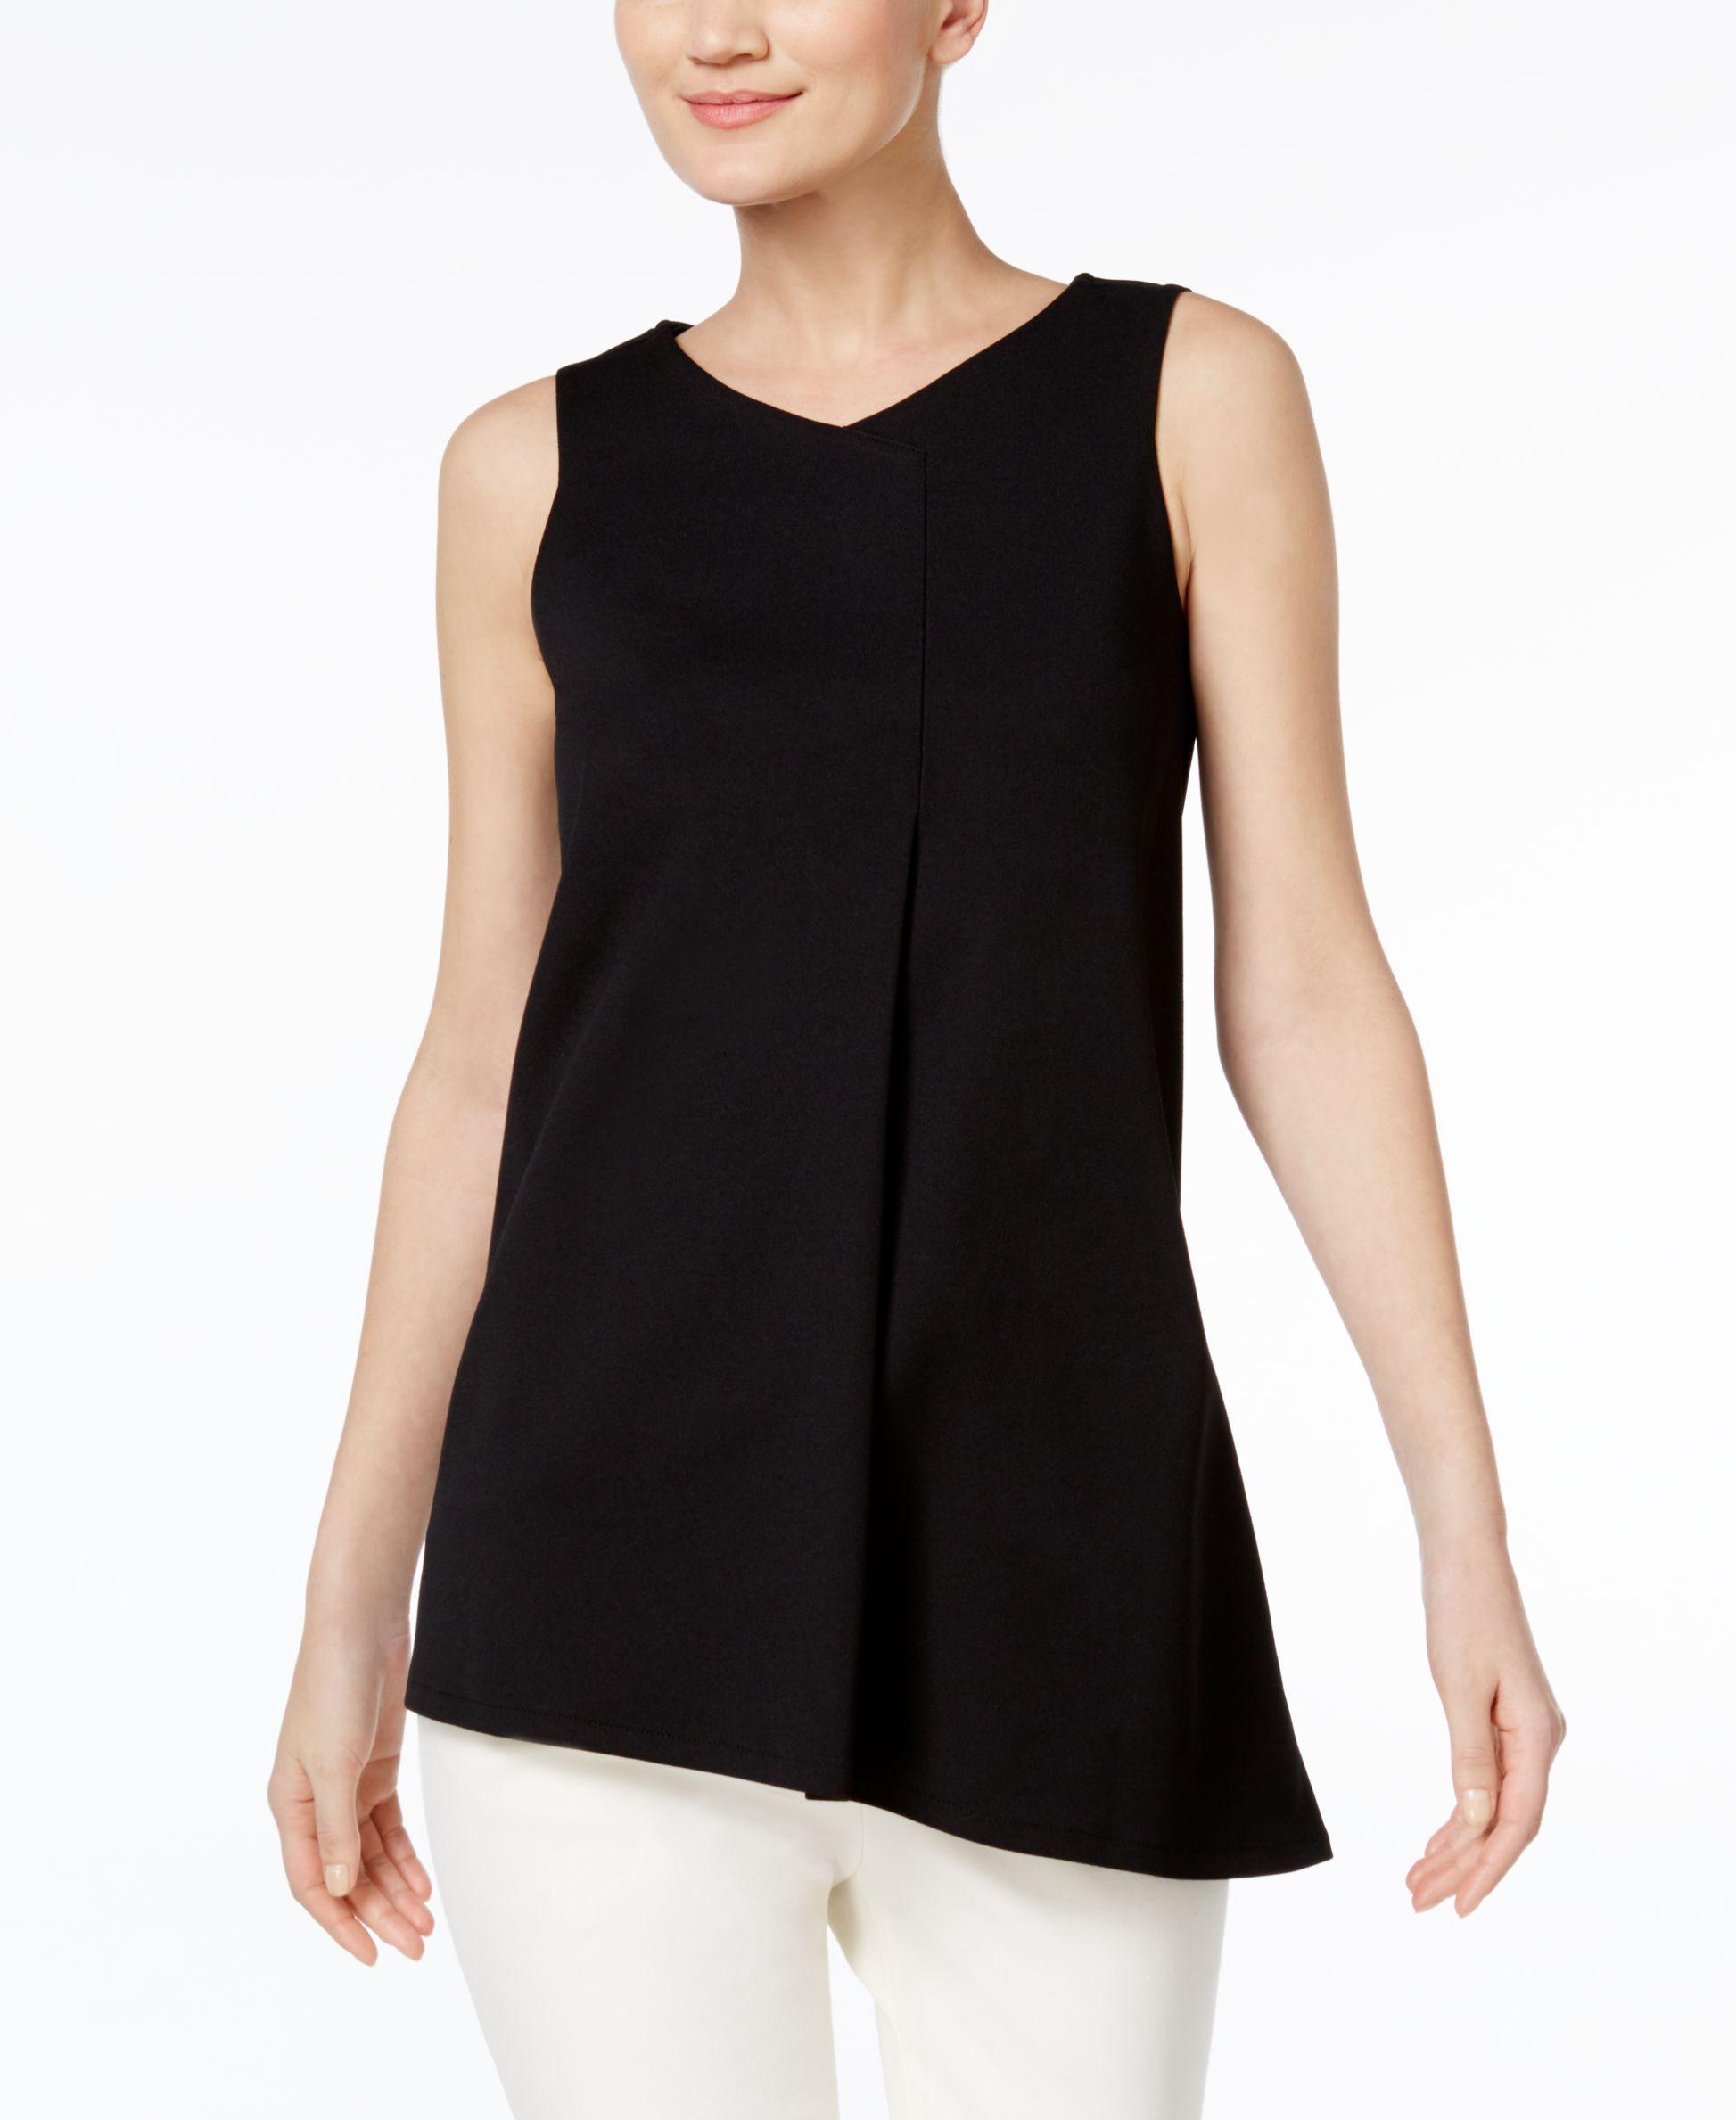 Alfani Womens Shirts Macys